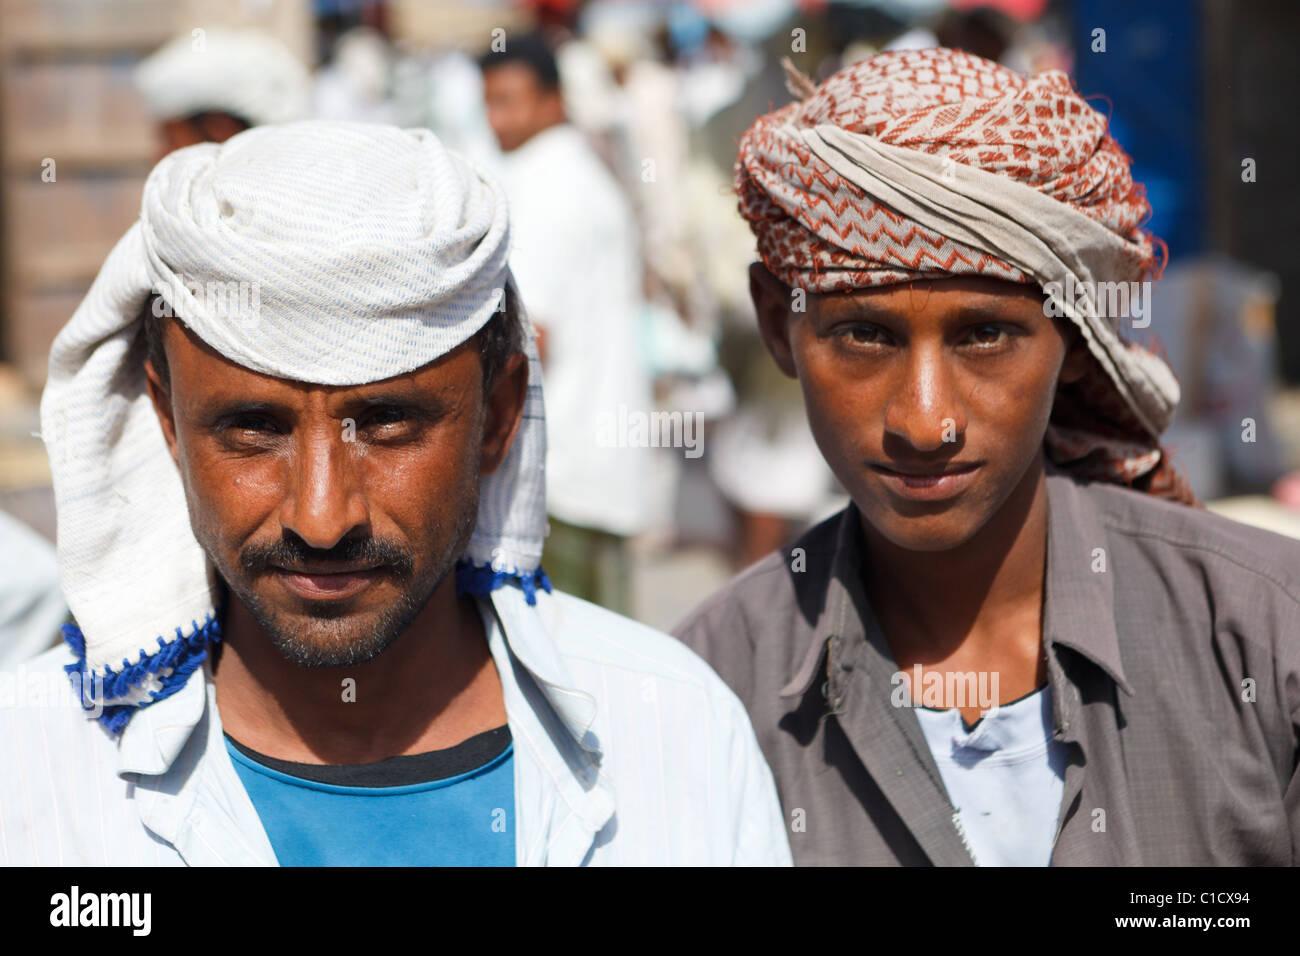 Two men at Bait Al Faqih Friday Market, Yemen - Stock Image